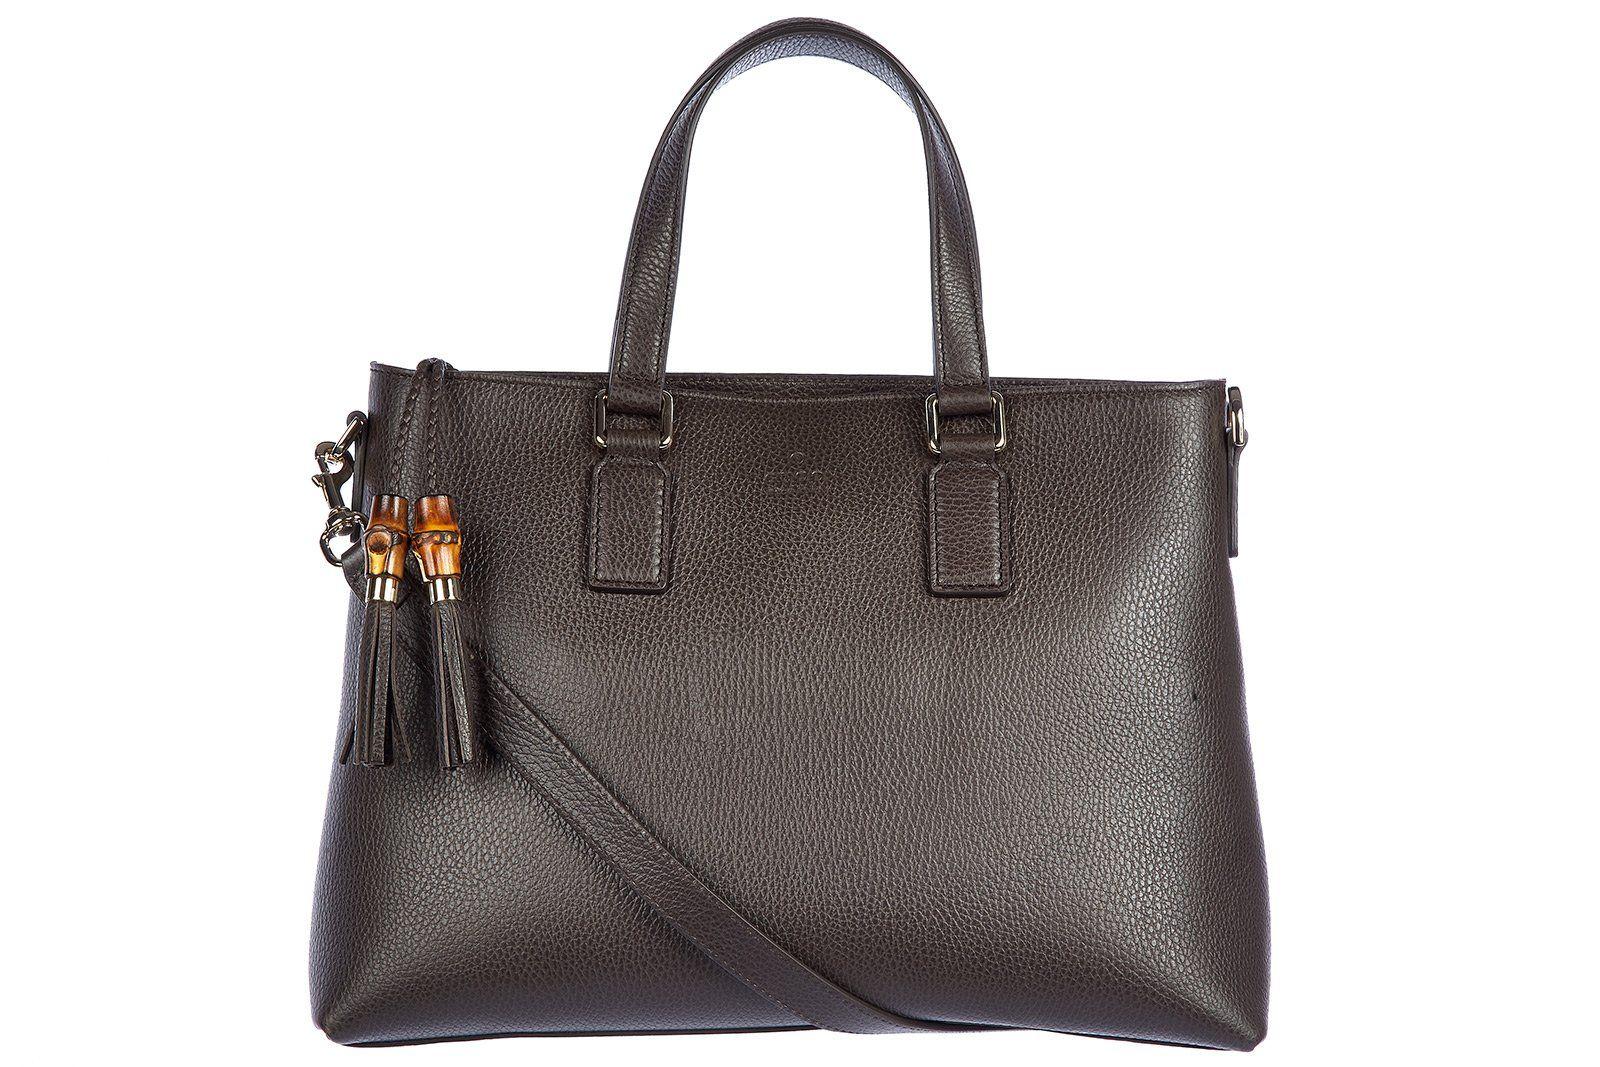 gucci leder handtasche damen tasche bag dollar calf braun must have handbags pinterest. Black Bedroom Furniture Sets. Home Design Ideas